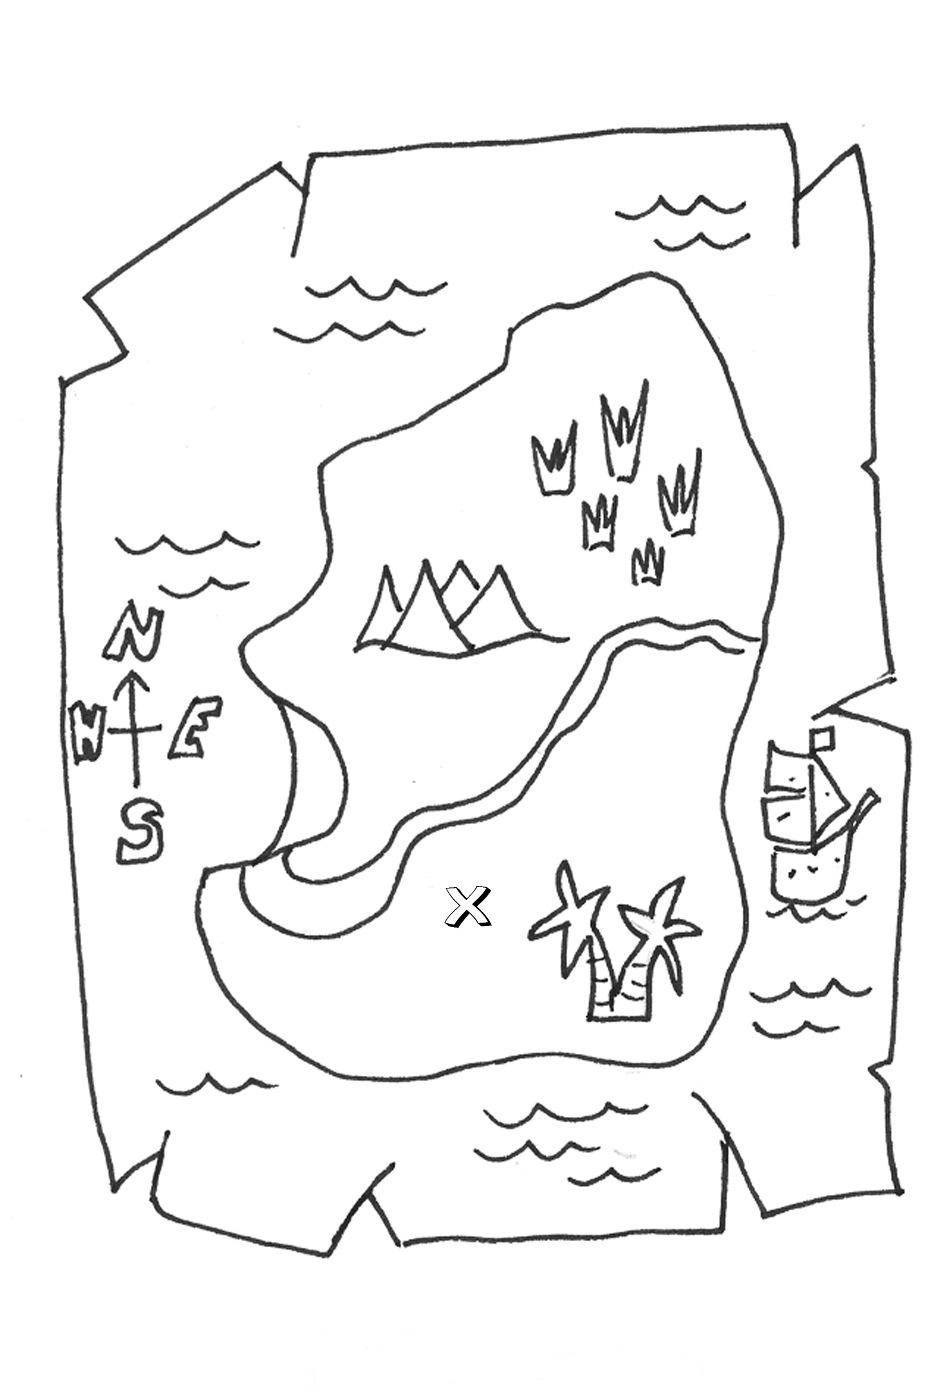 map coloring algorithm c map coloring world map coloring book page - Map Coloring Book